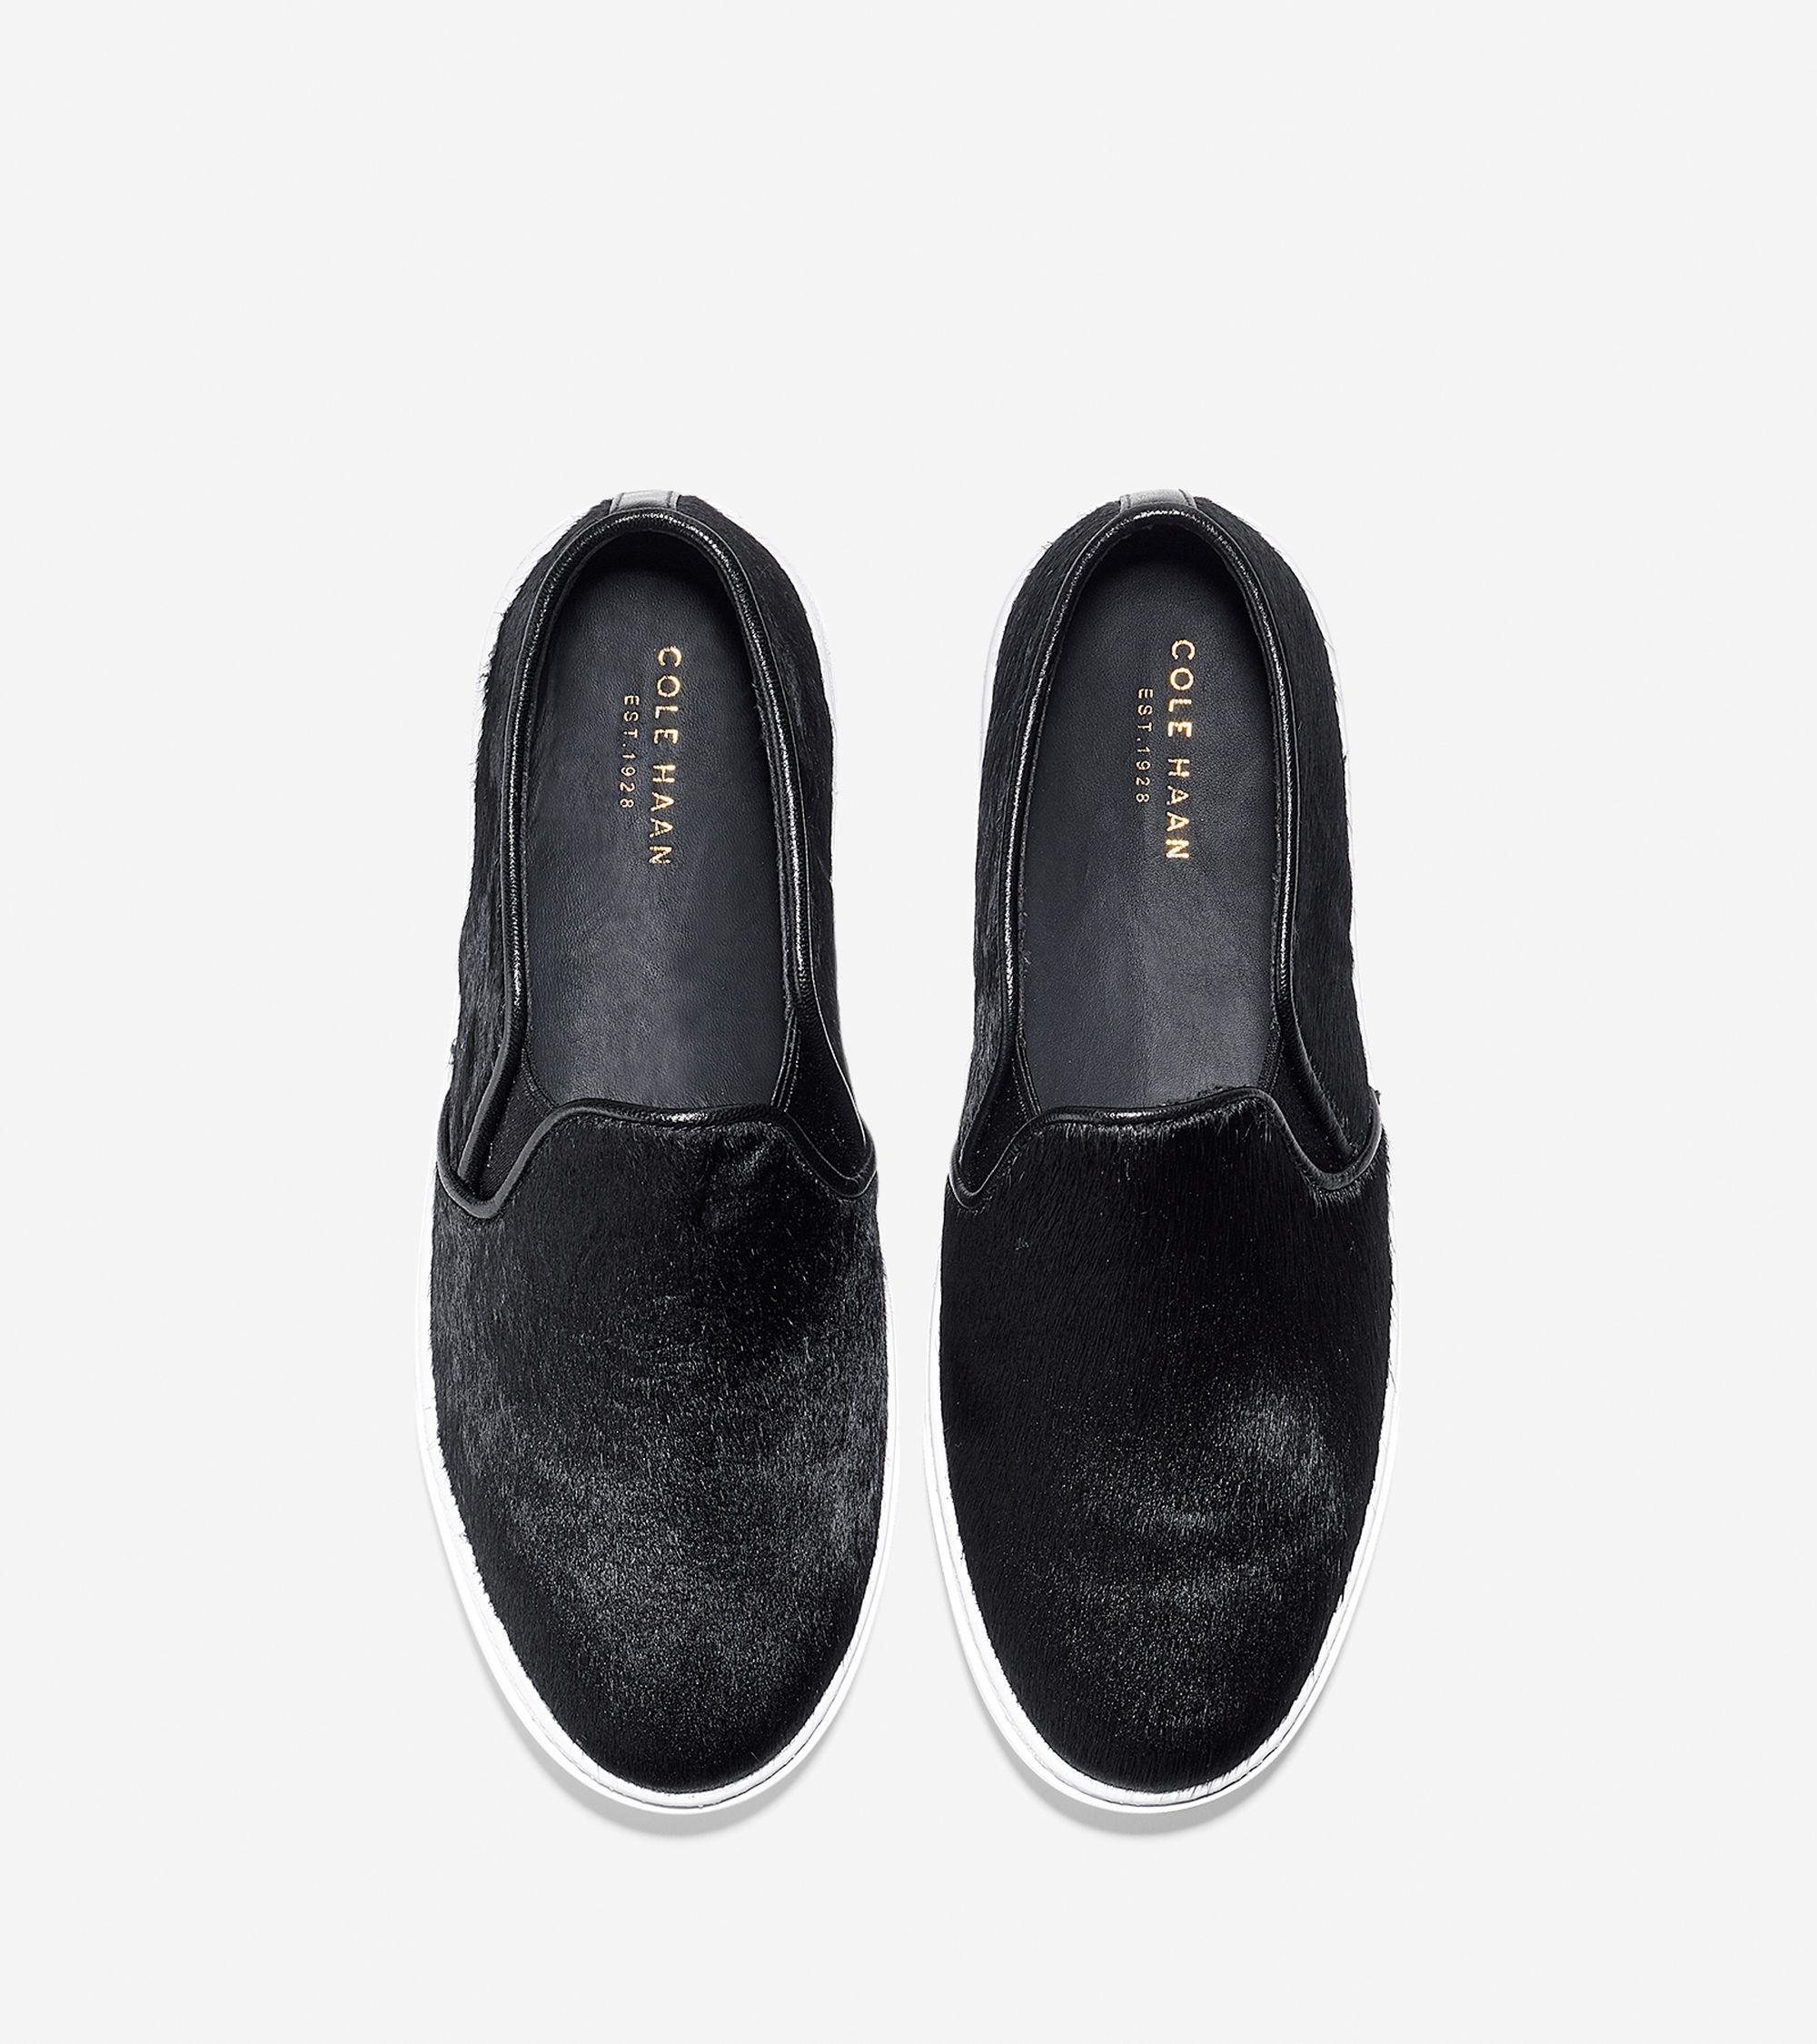 Cole Haan Bowie Slipon Sneaker bbFhIrwbx